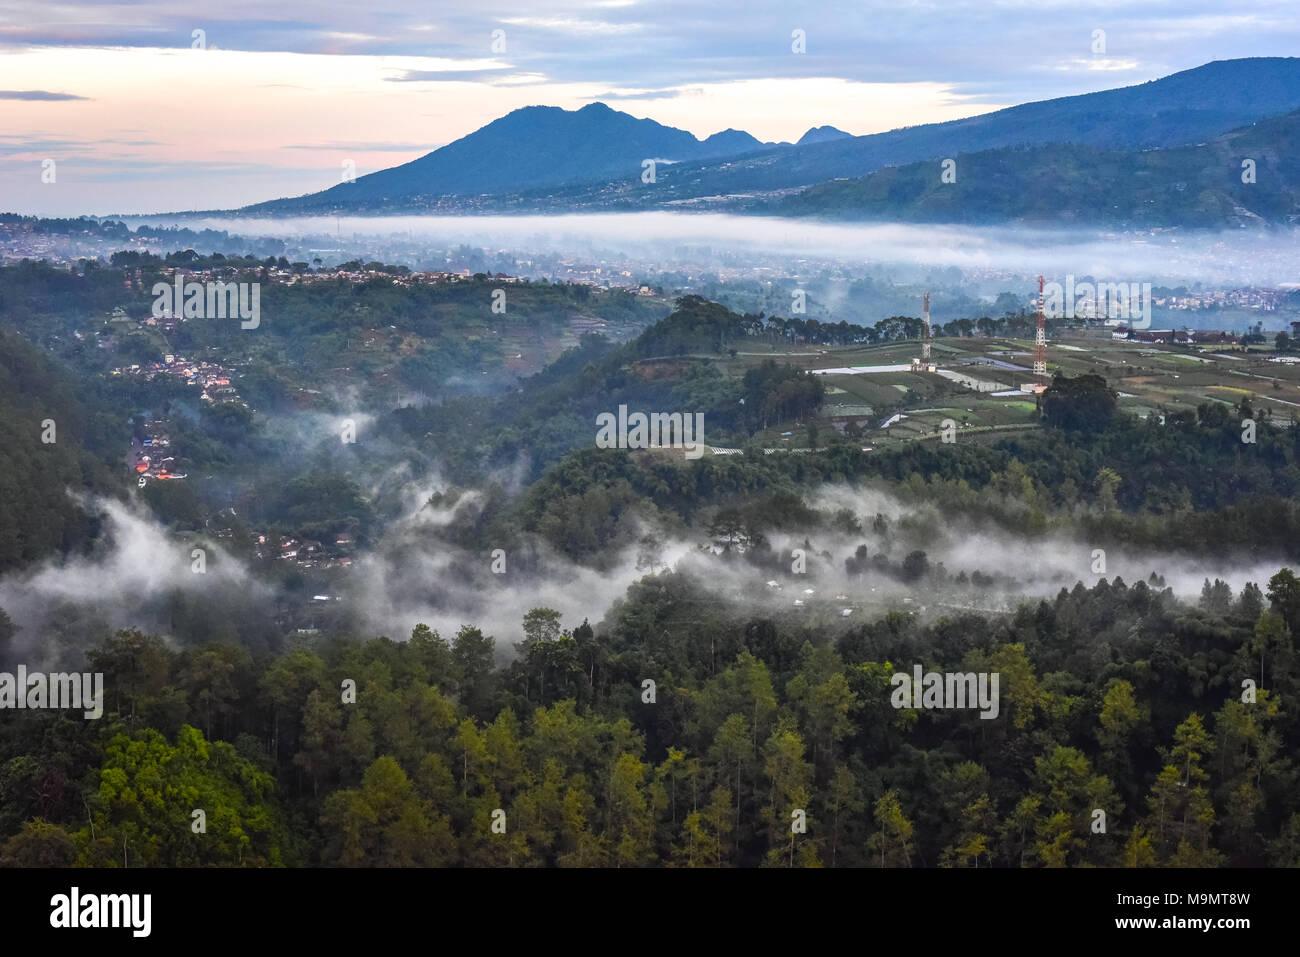 Mount Burangrang, Mount Tangkubanperahu, Lembang Fault, and the city of Lembang in the northern part of Bandung Basin, West Java, Indonesia. - Stock Image